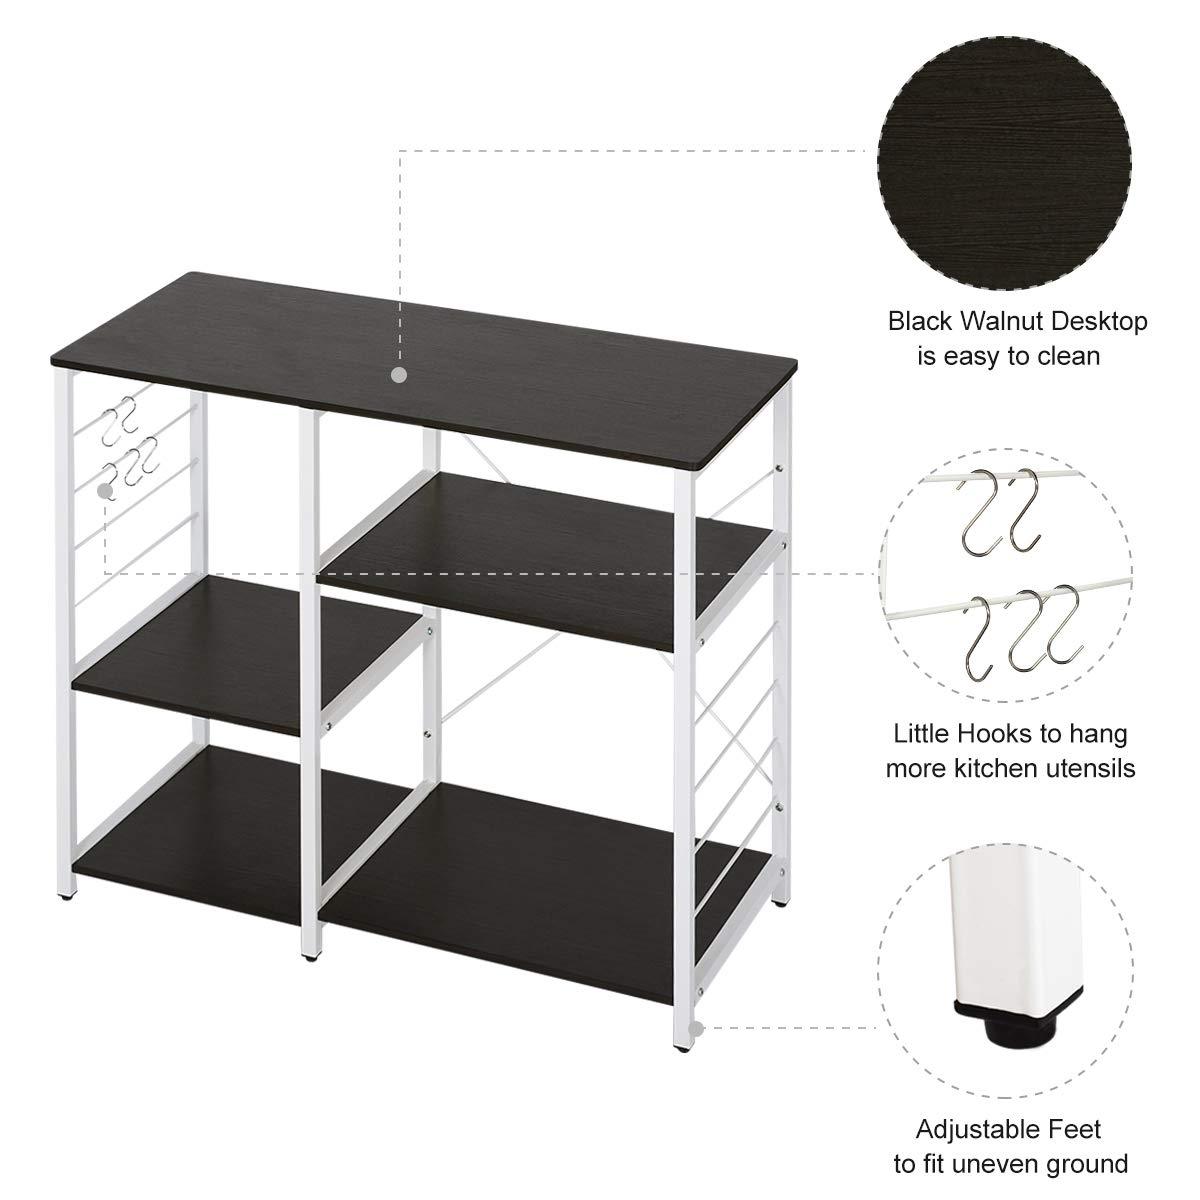 WLIVE Multi-Purpose Wood Kitchen Cart (Black) by WLIVE (Image #3)